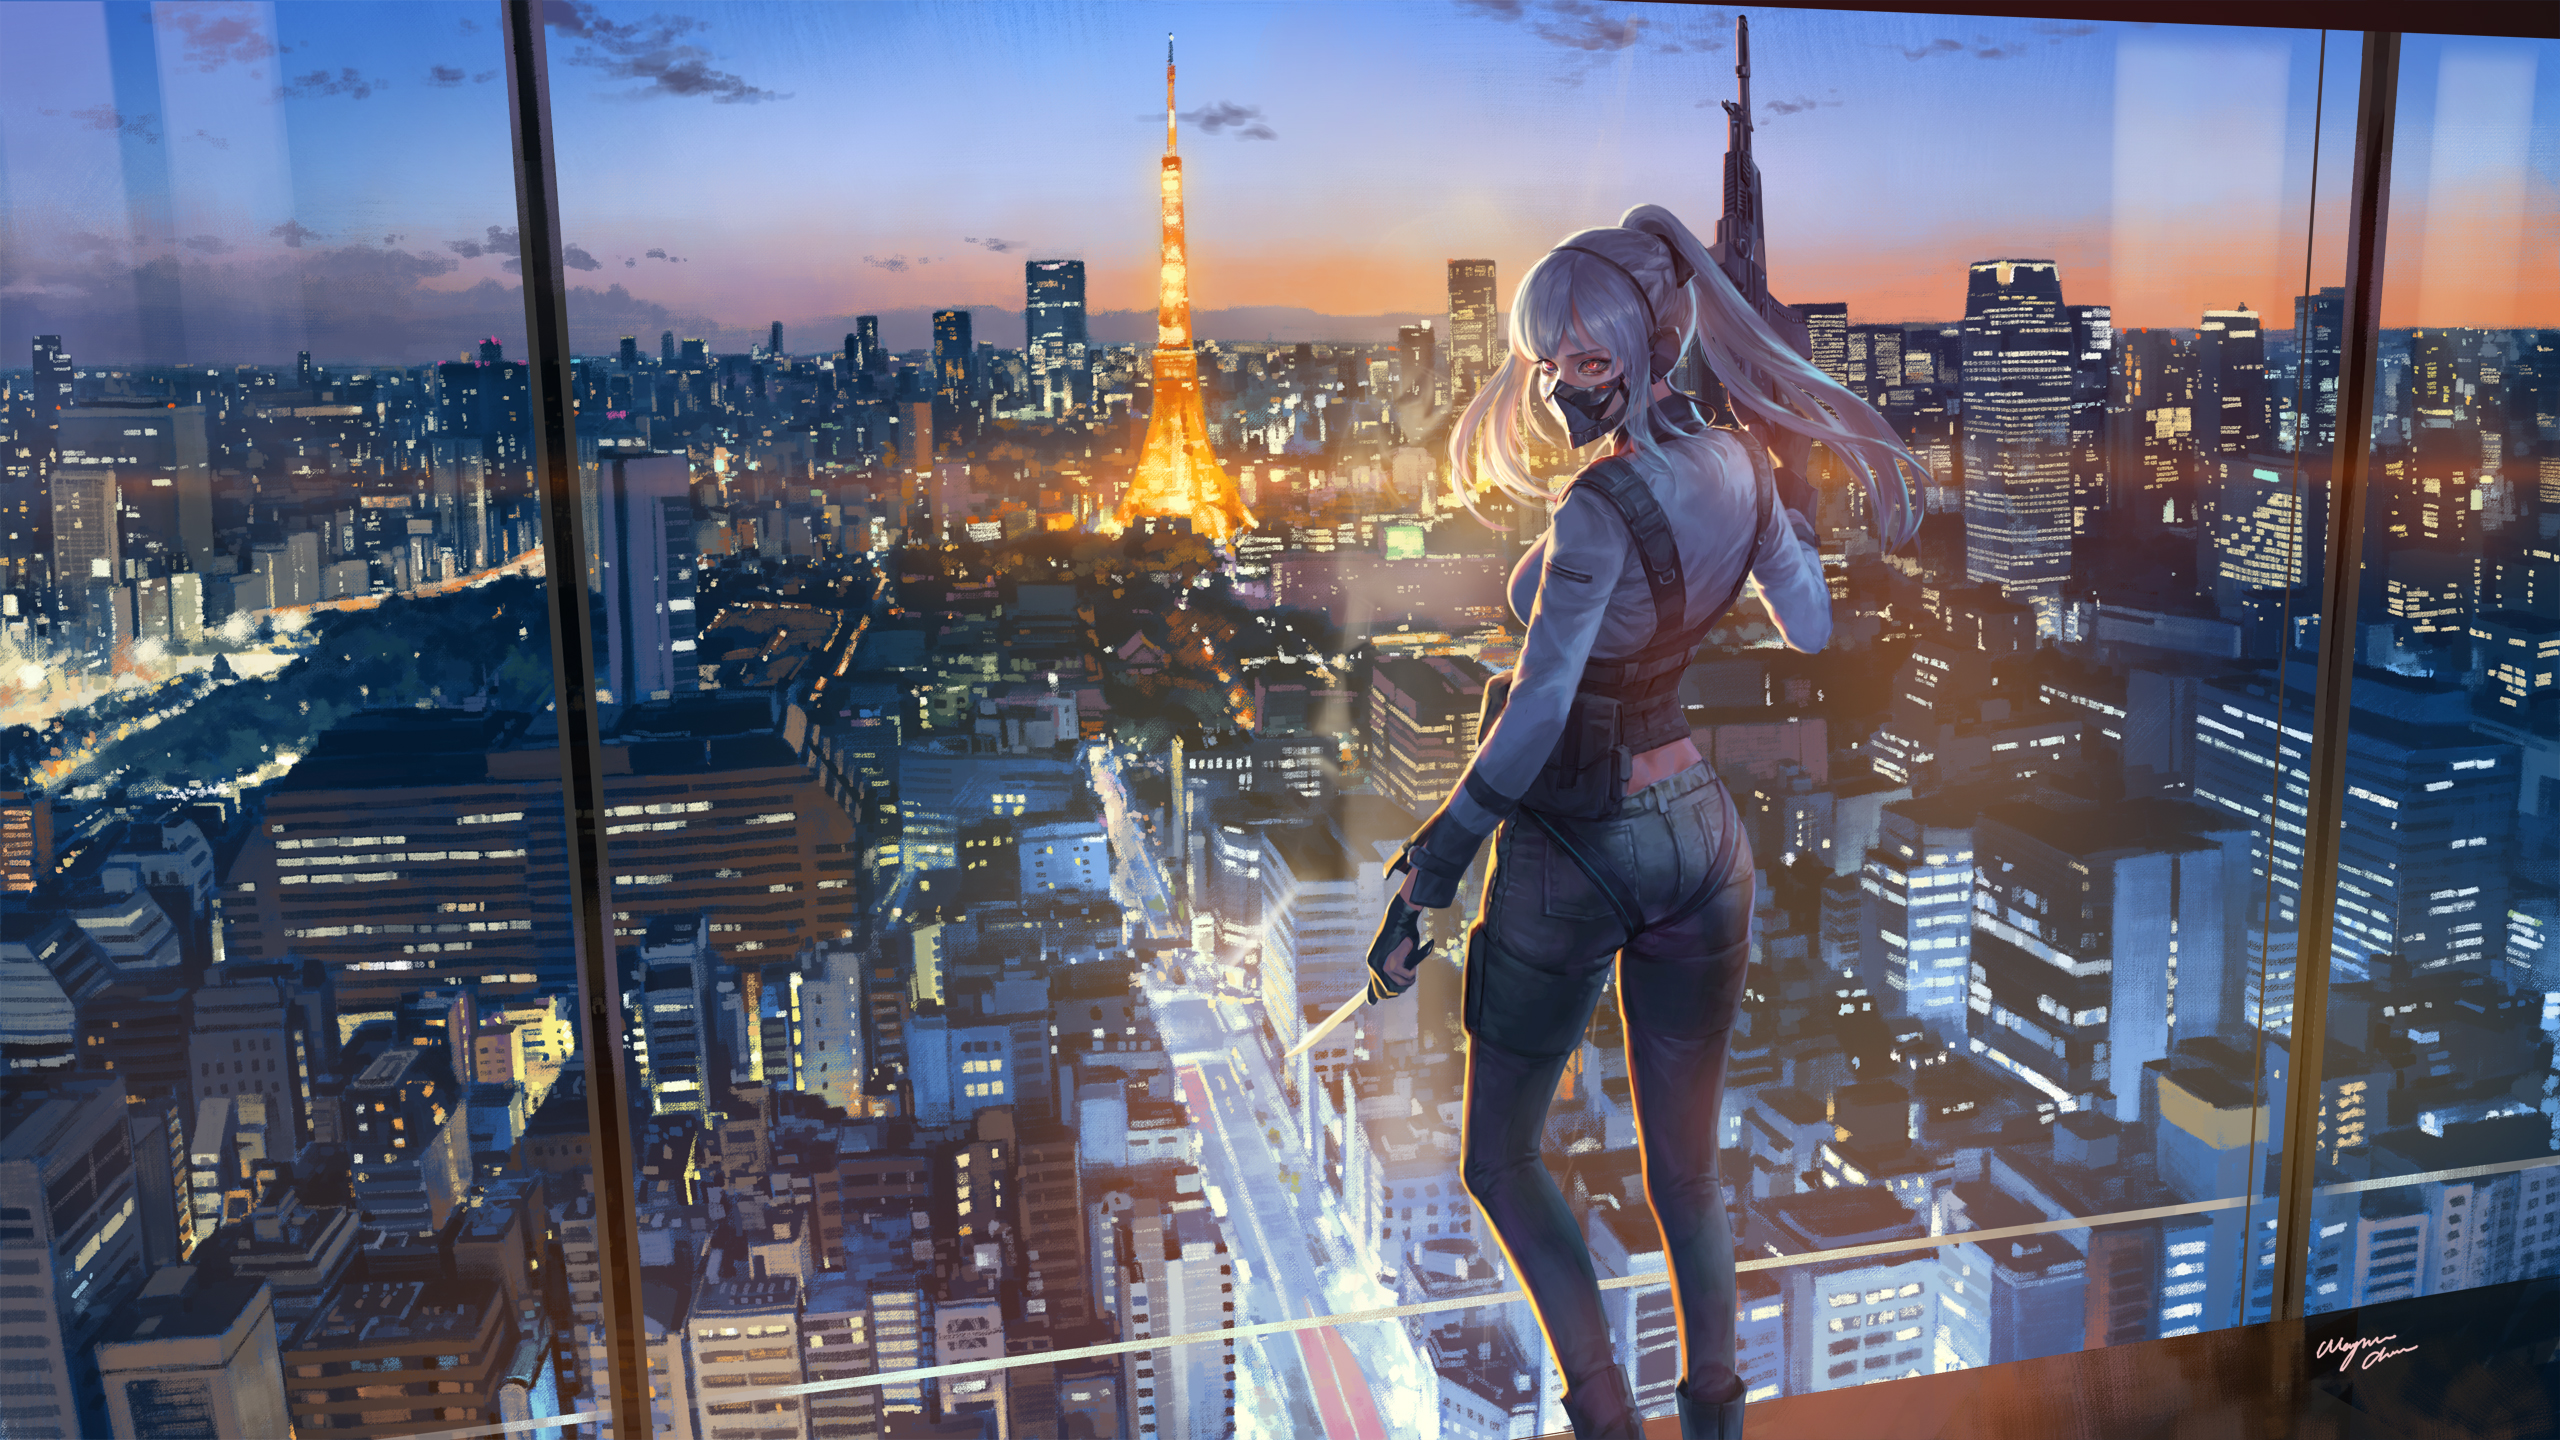 Anime 2560x1440 Girls Frontline city weapon machine gun gun artwork women mask night city lights